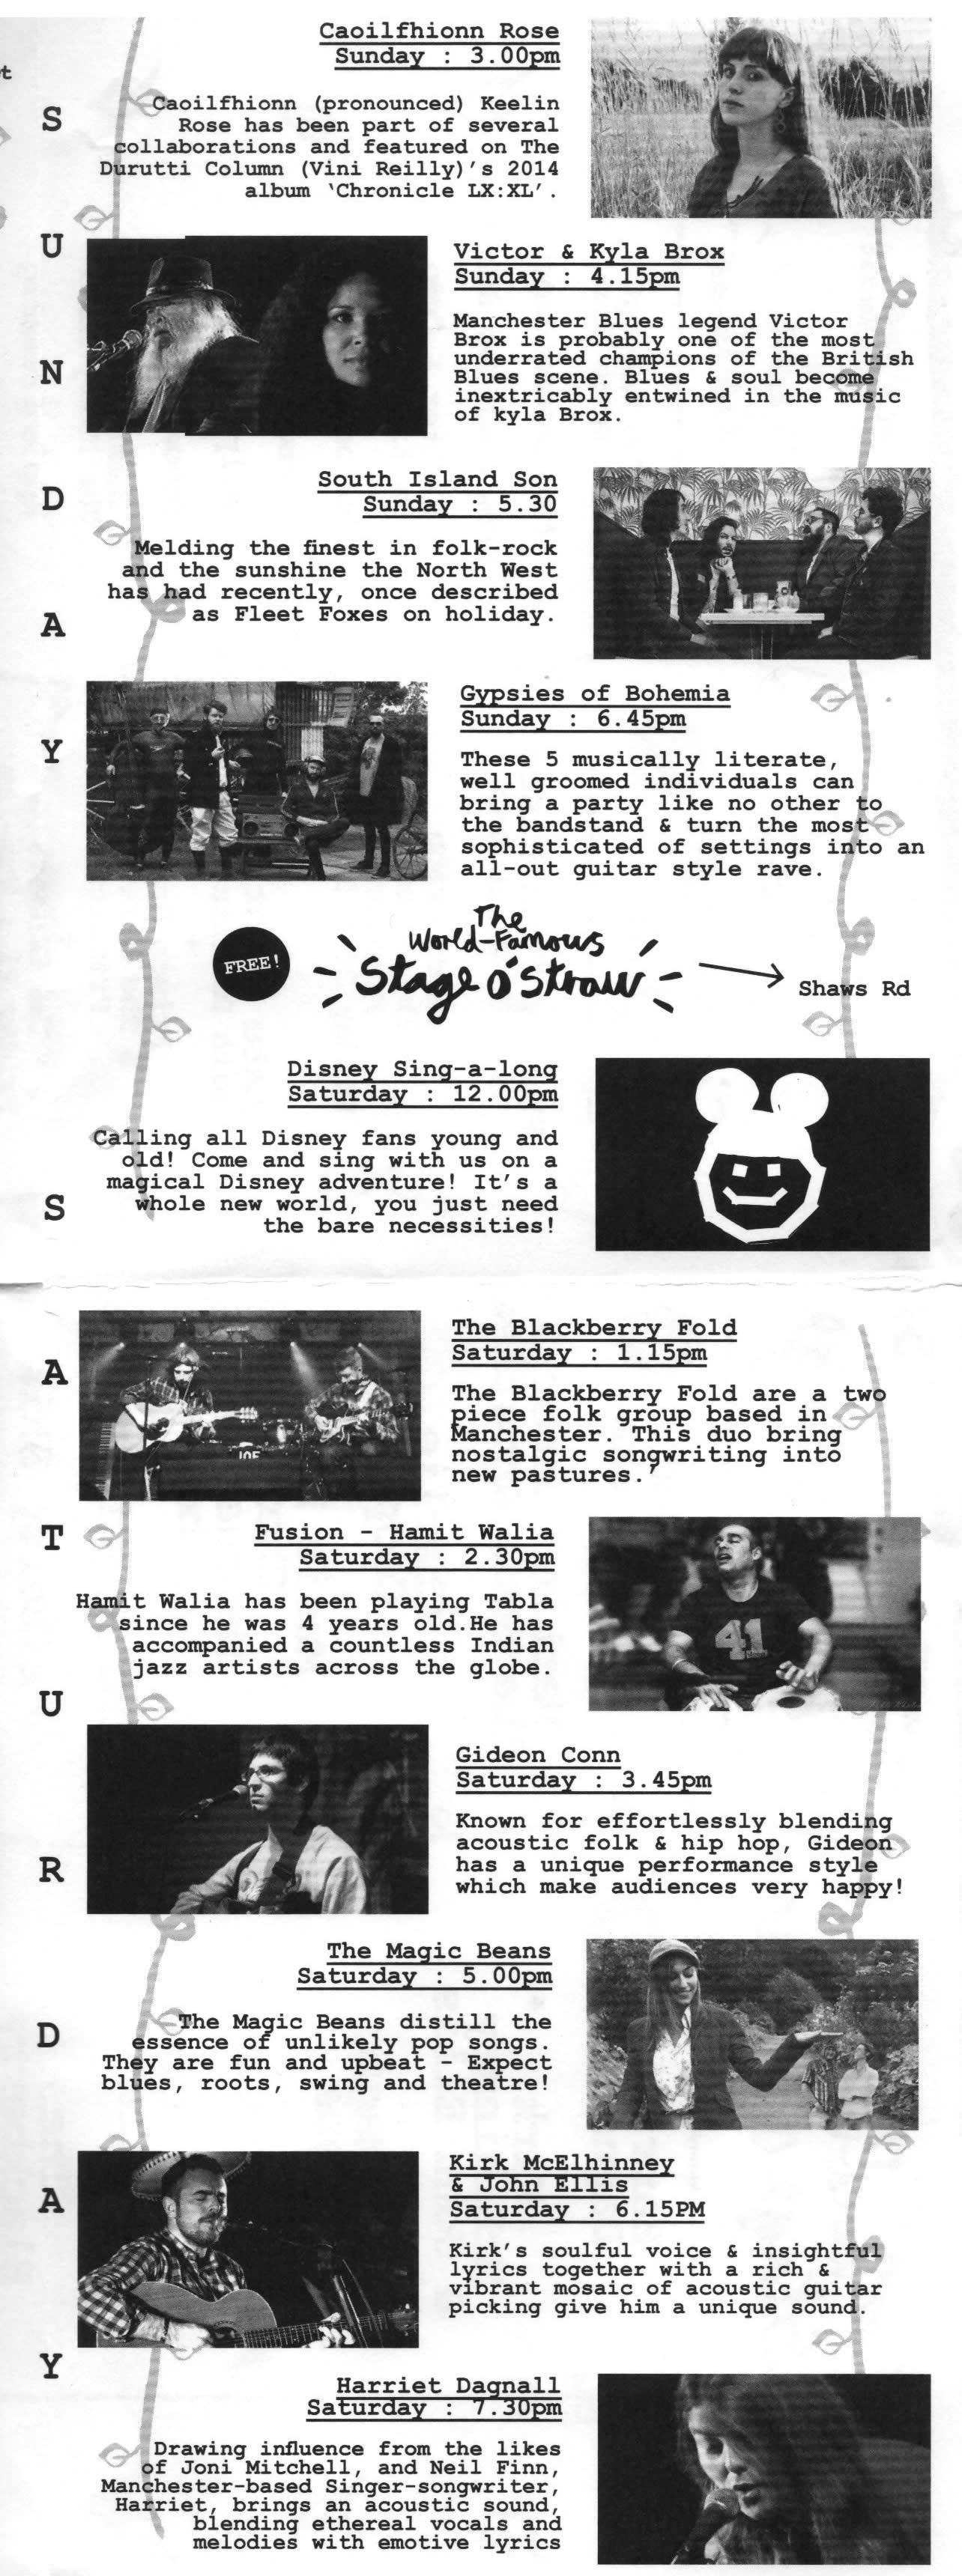 Main Stage & Stage o Straw